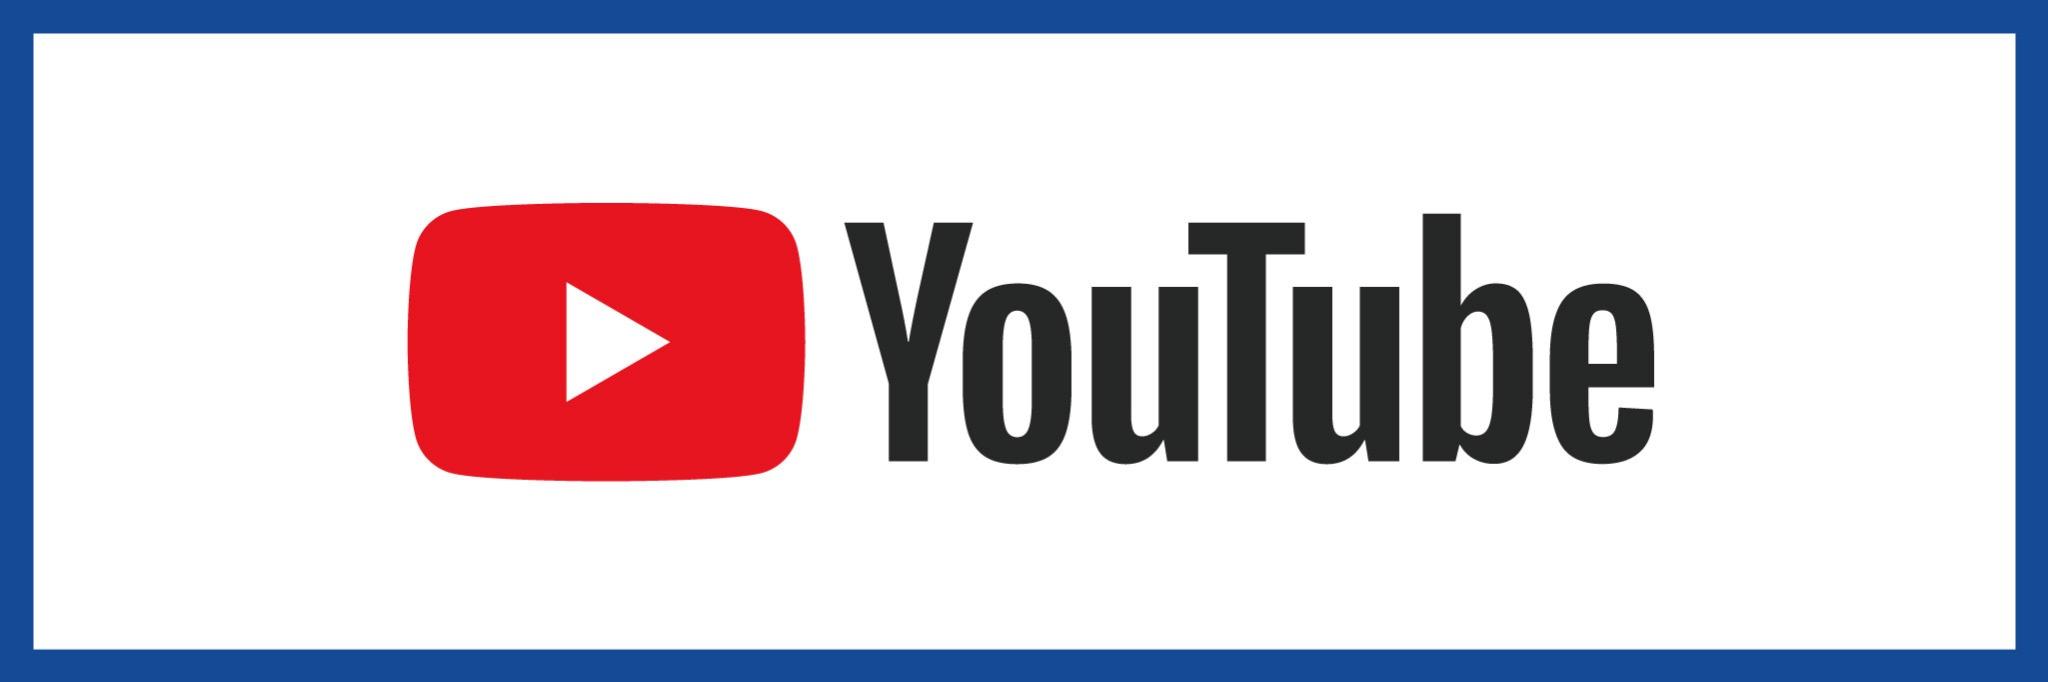 YouTube公式入試チャンネル